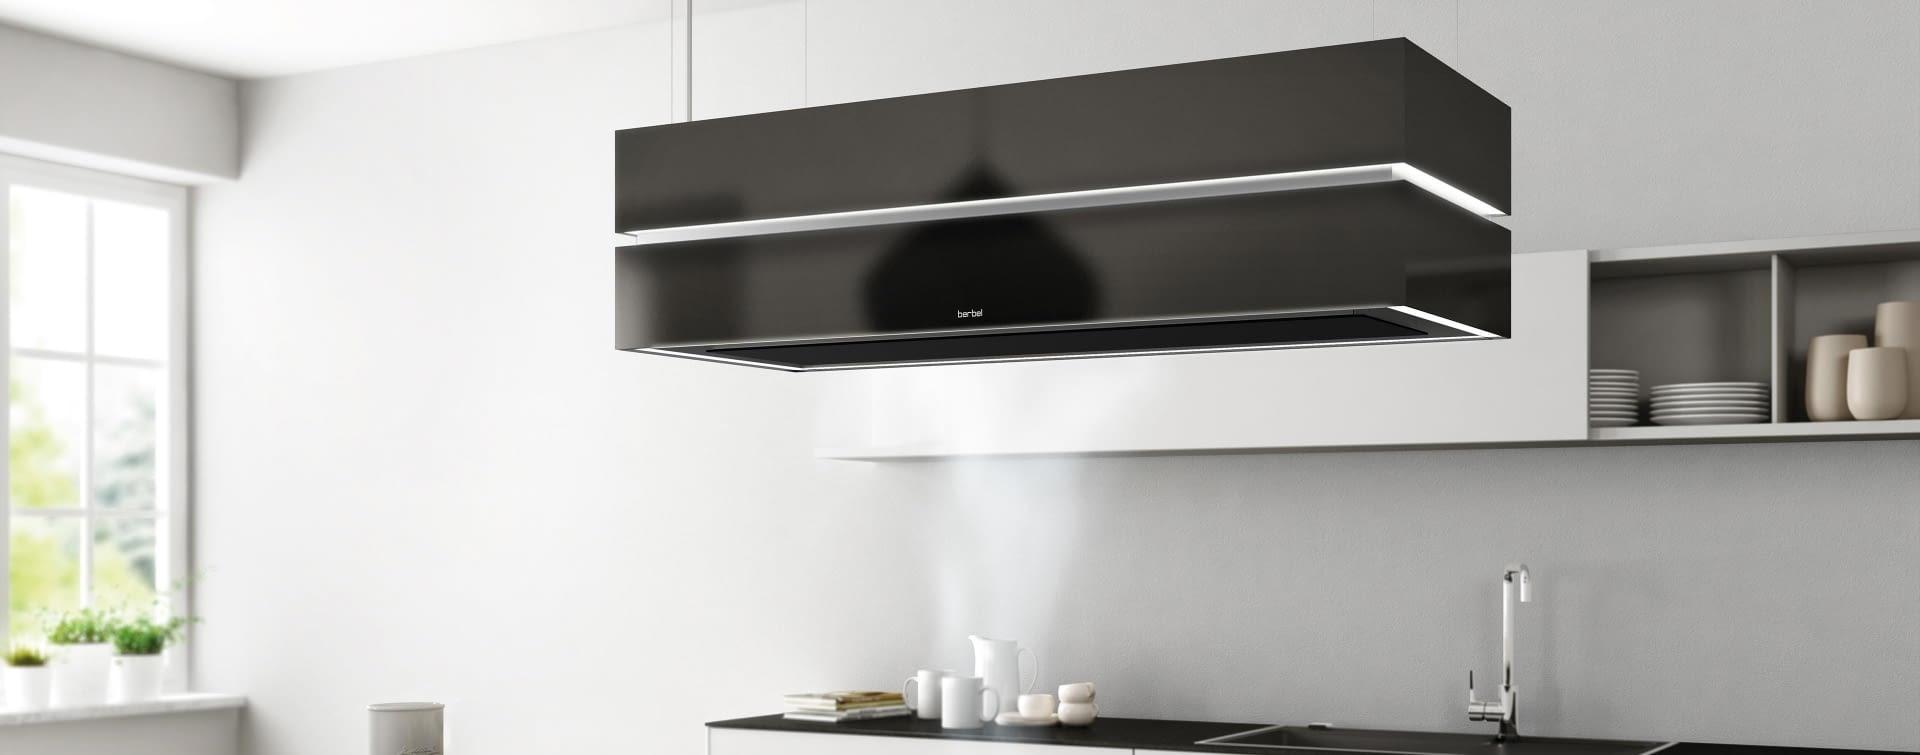 kuche mit bora abzug stiftung warentest schn kche dunstabzug wandfarbe weiss test schn bora. Black Bedroom Furniture Sets. Home Design Ideas